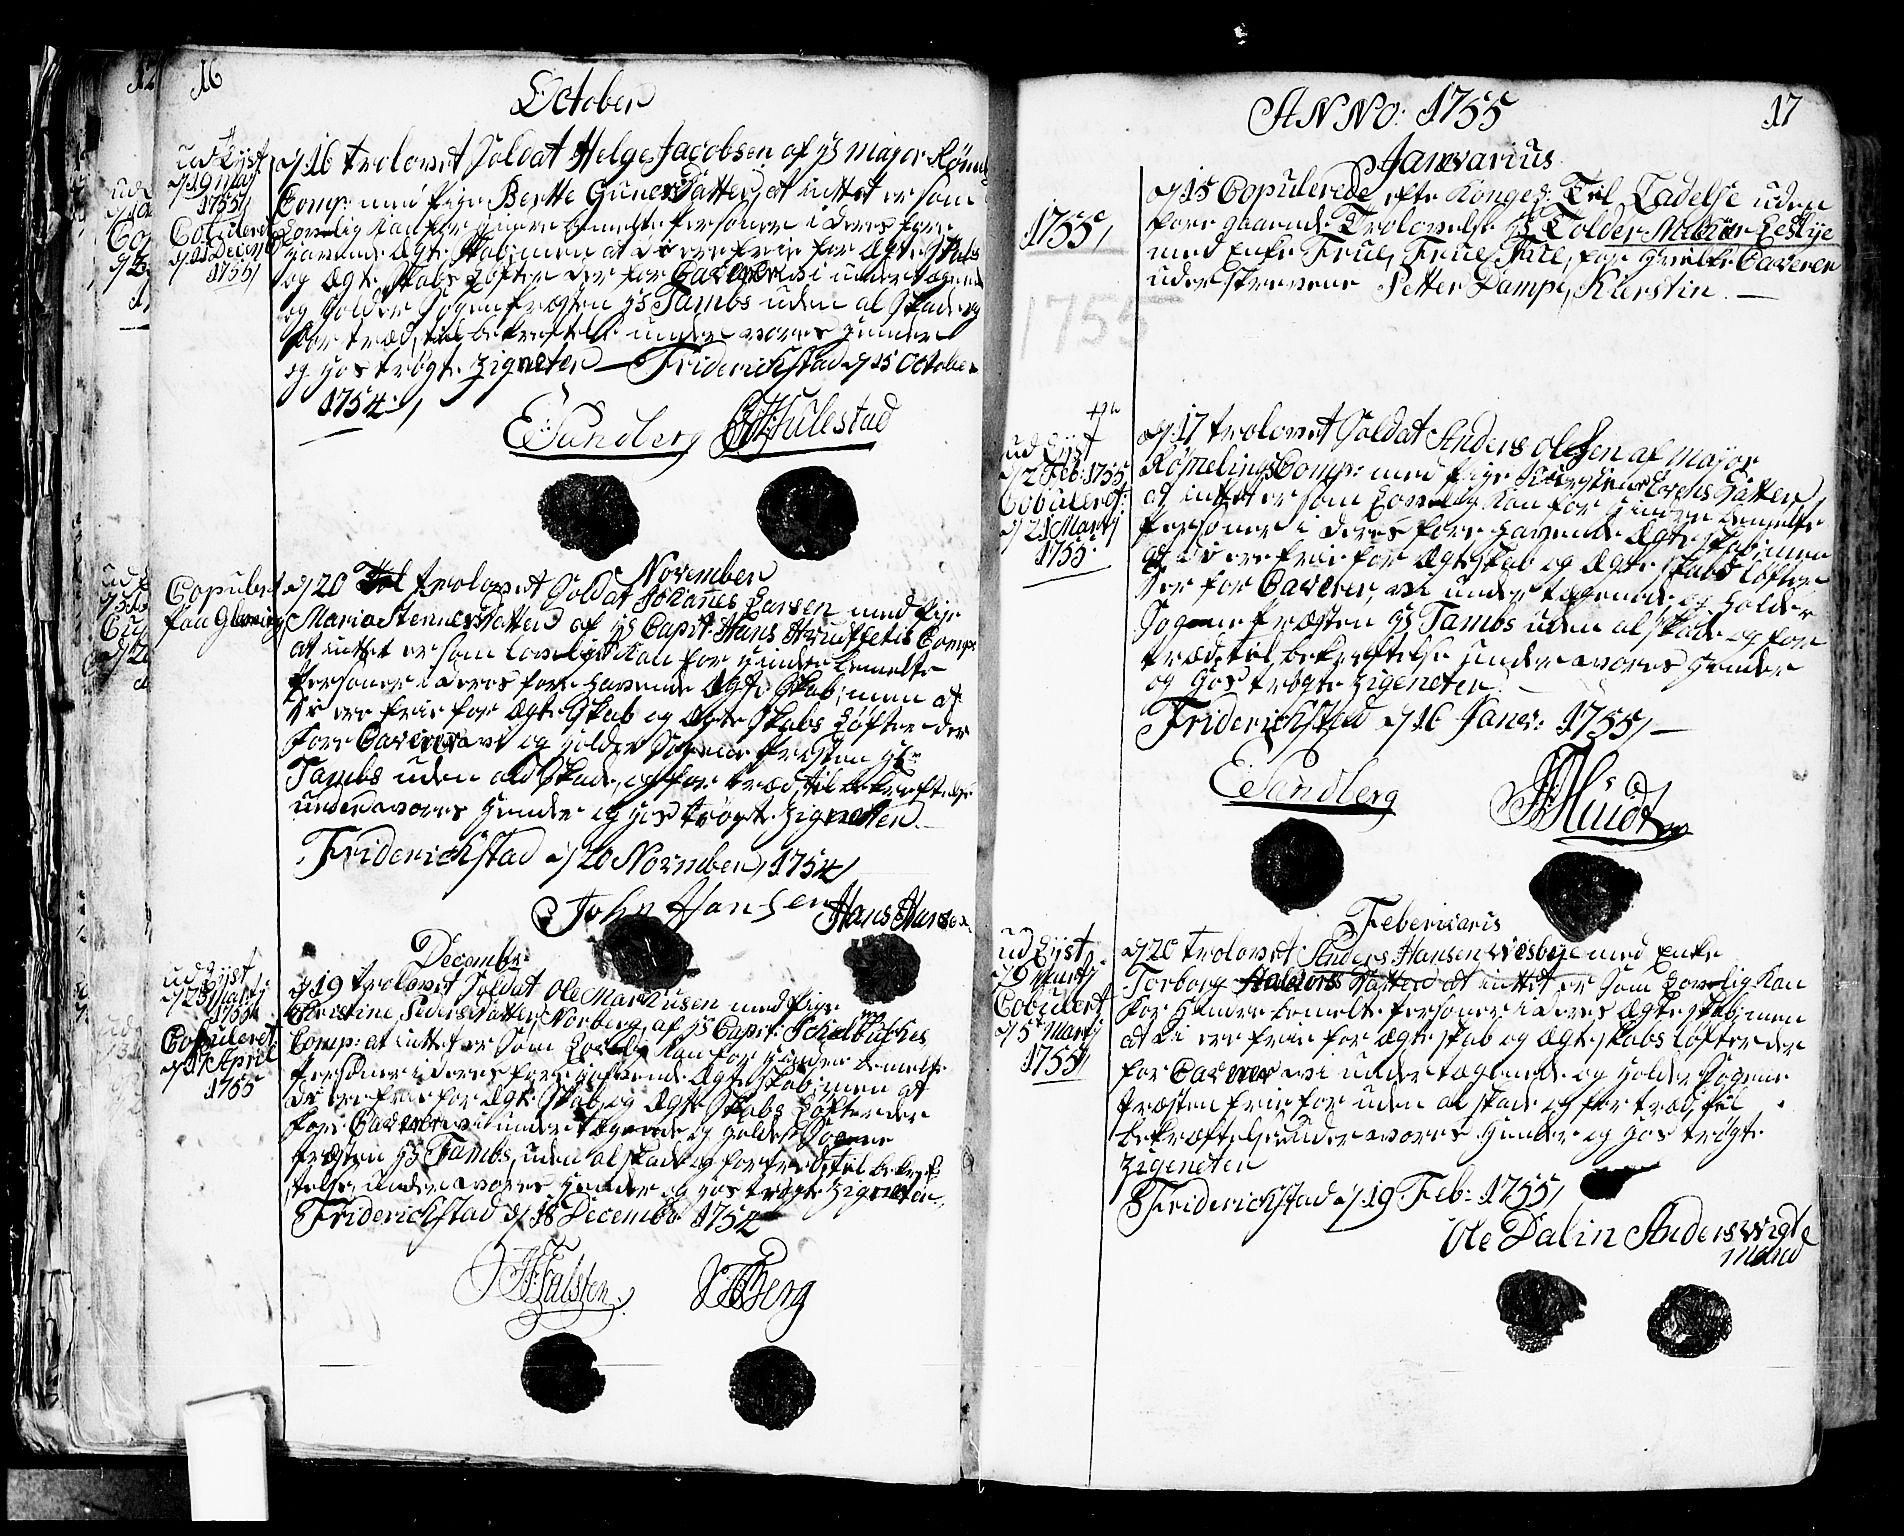 SAO, Fredrikstad prestekontor Kirkebøker, F/Fa/L0002: Ministerialbok nr. 2, 1750-1804, s. 16-17